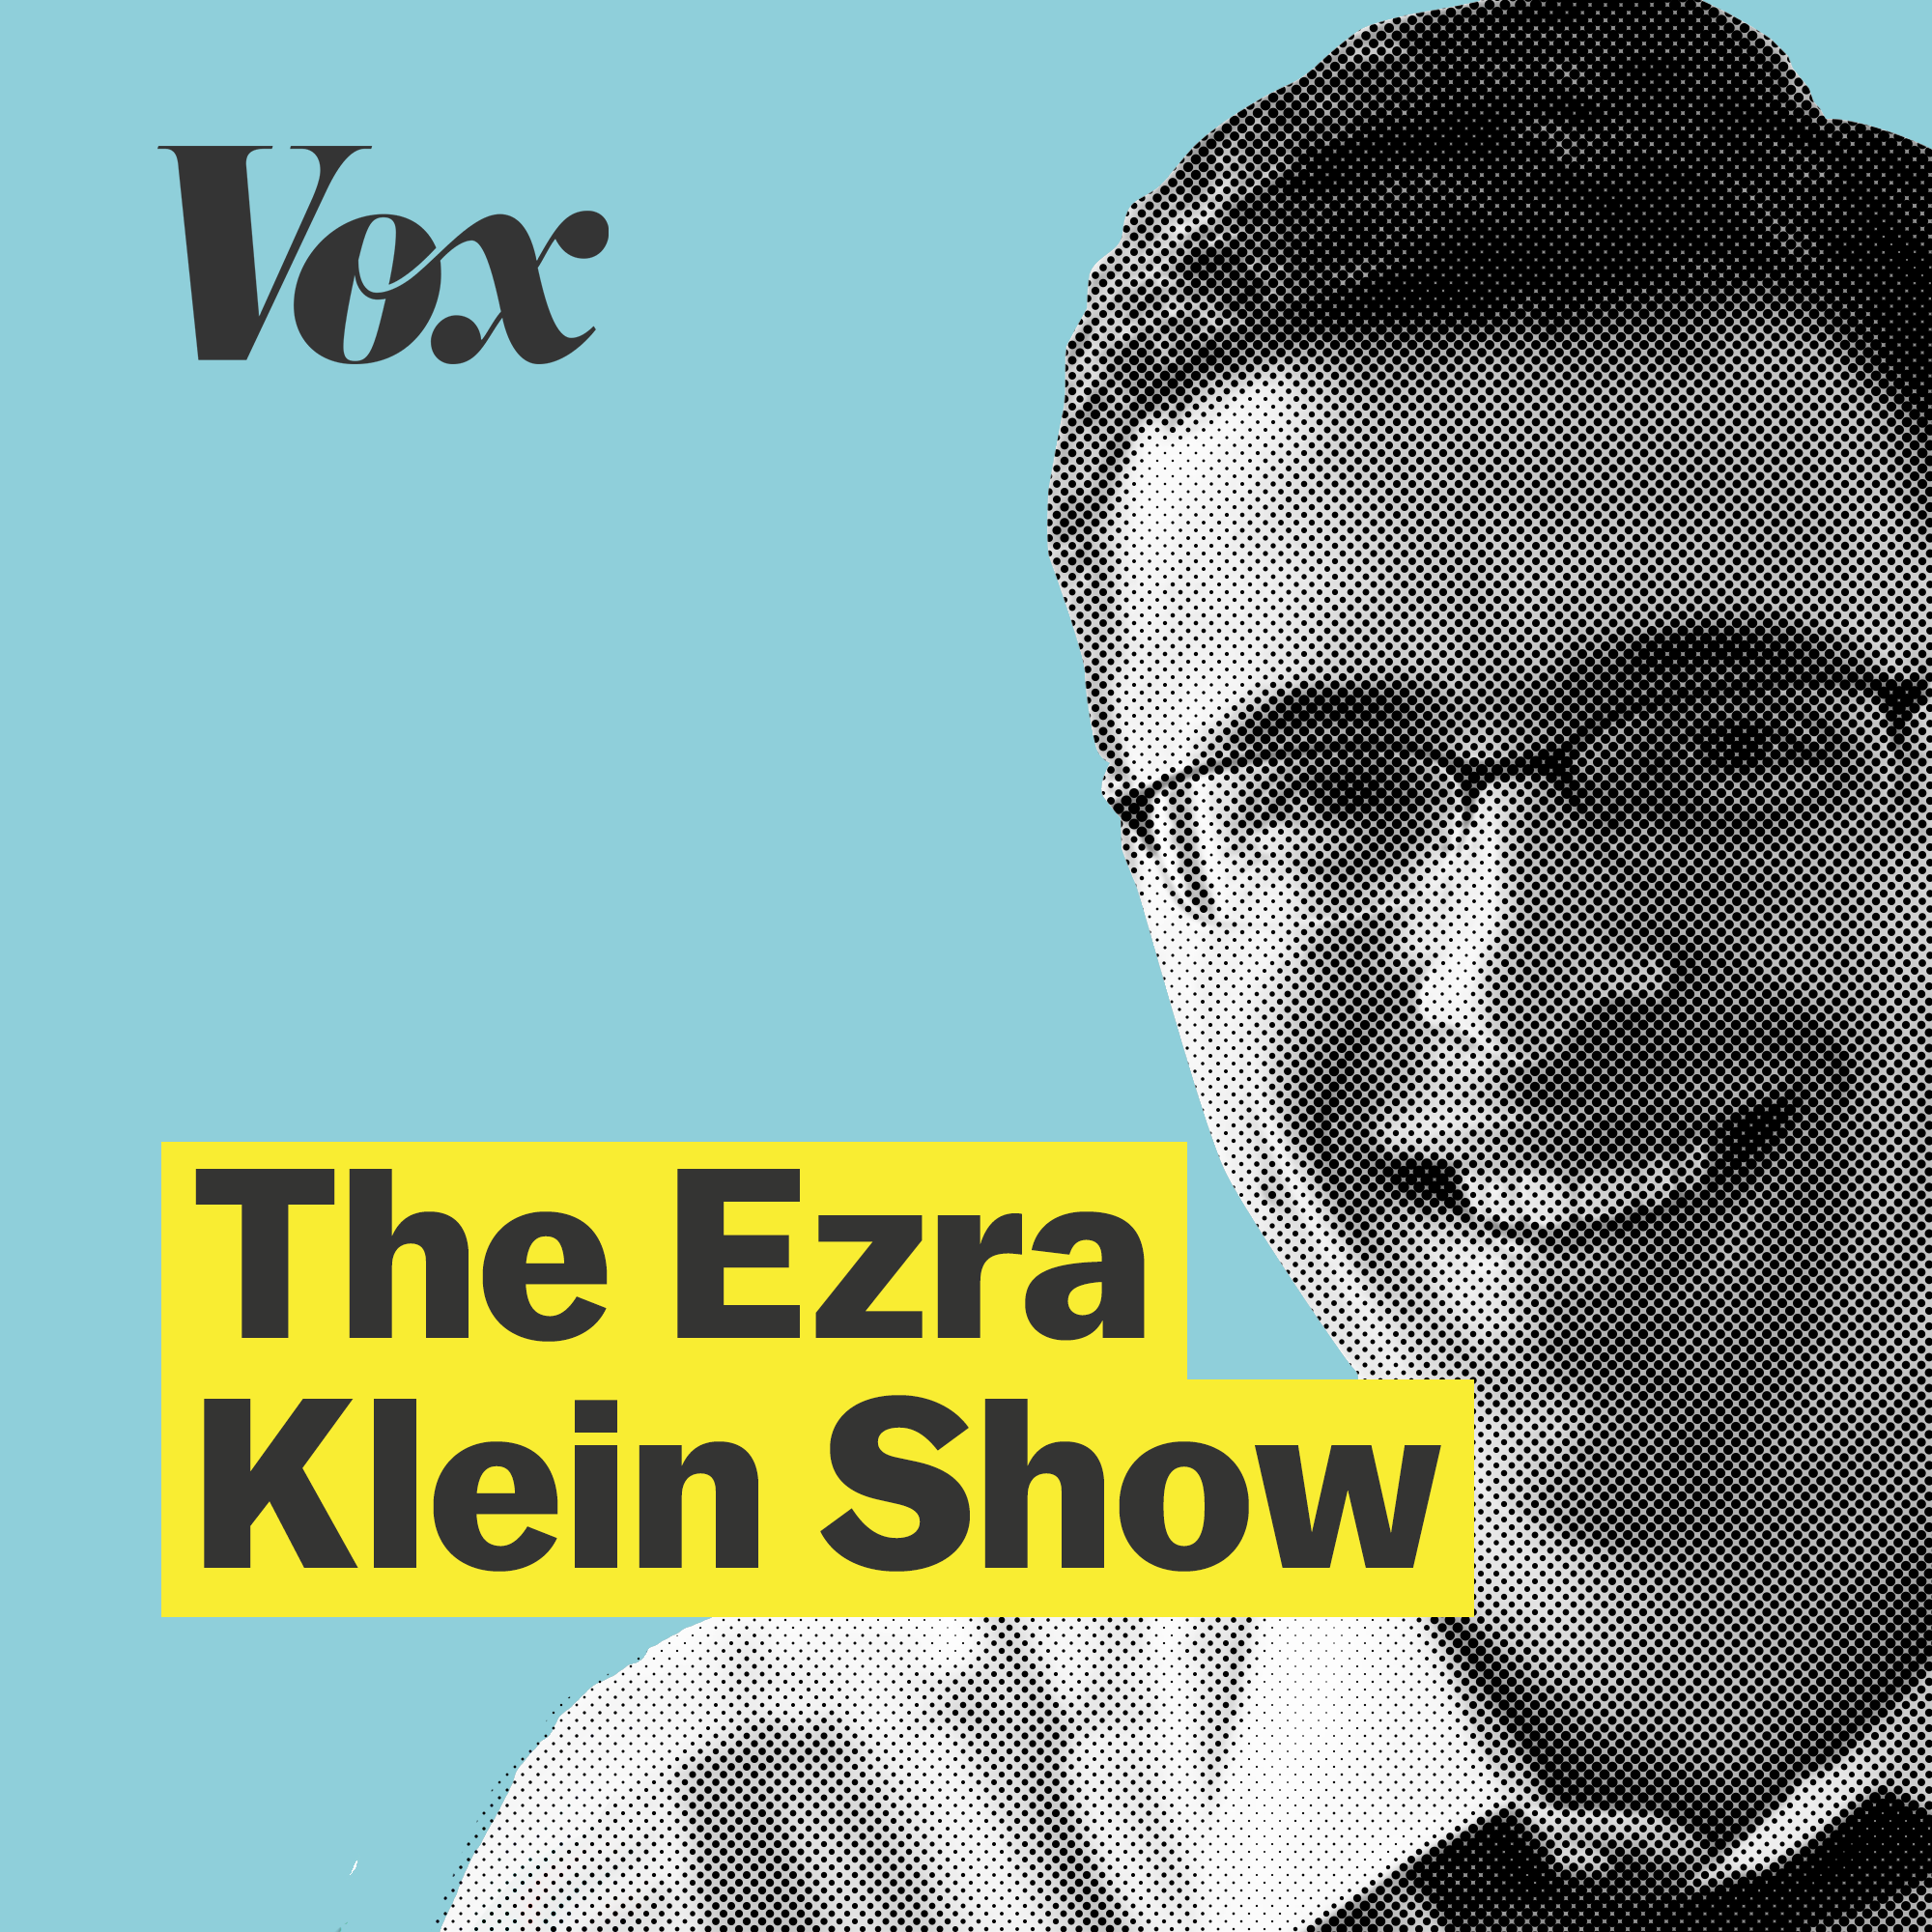 Ezra_Klein_show_podcast_Vox.0.png